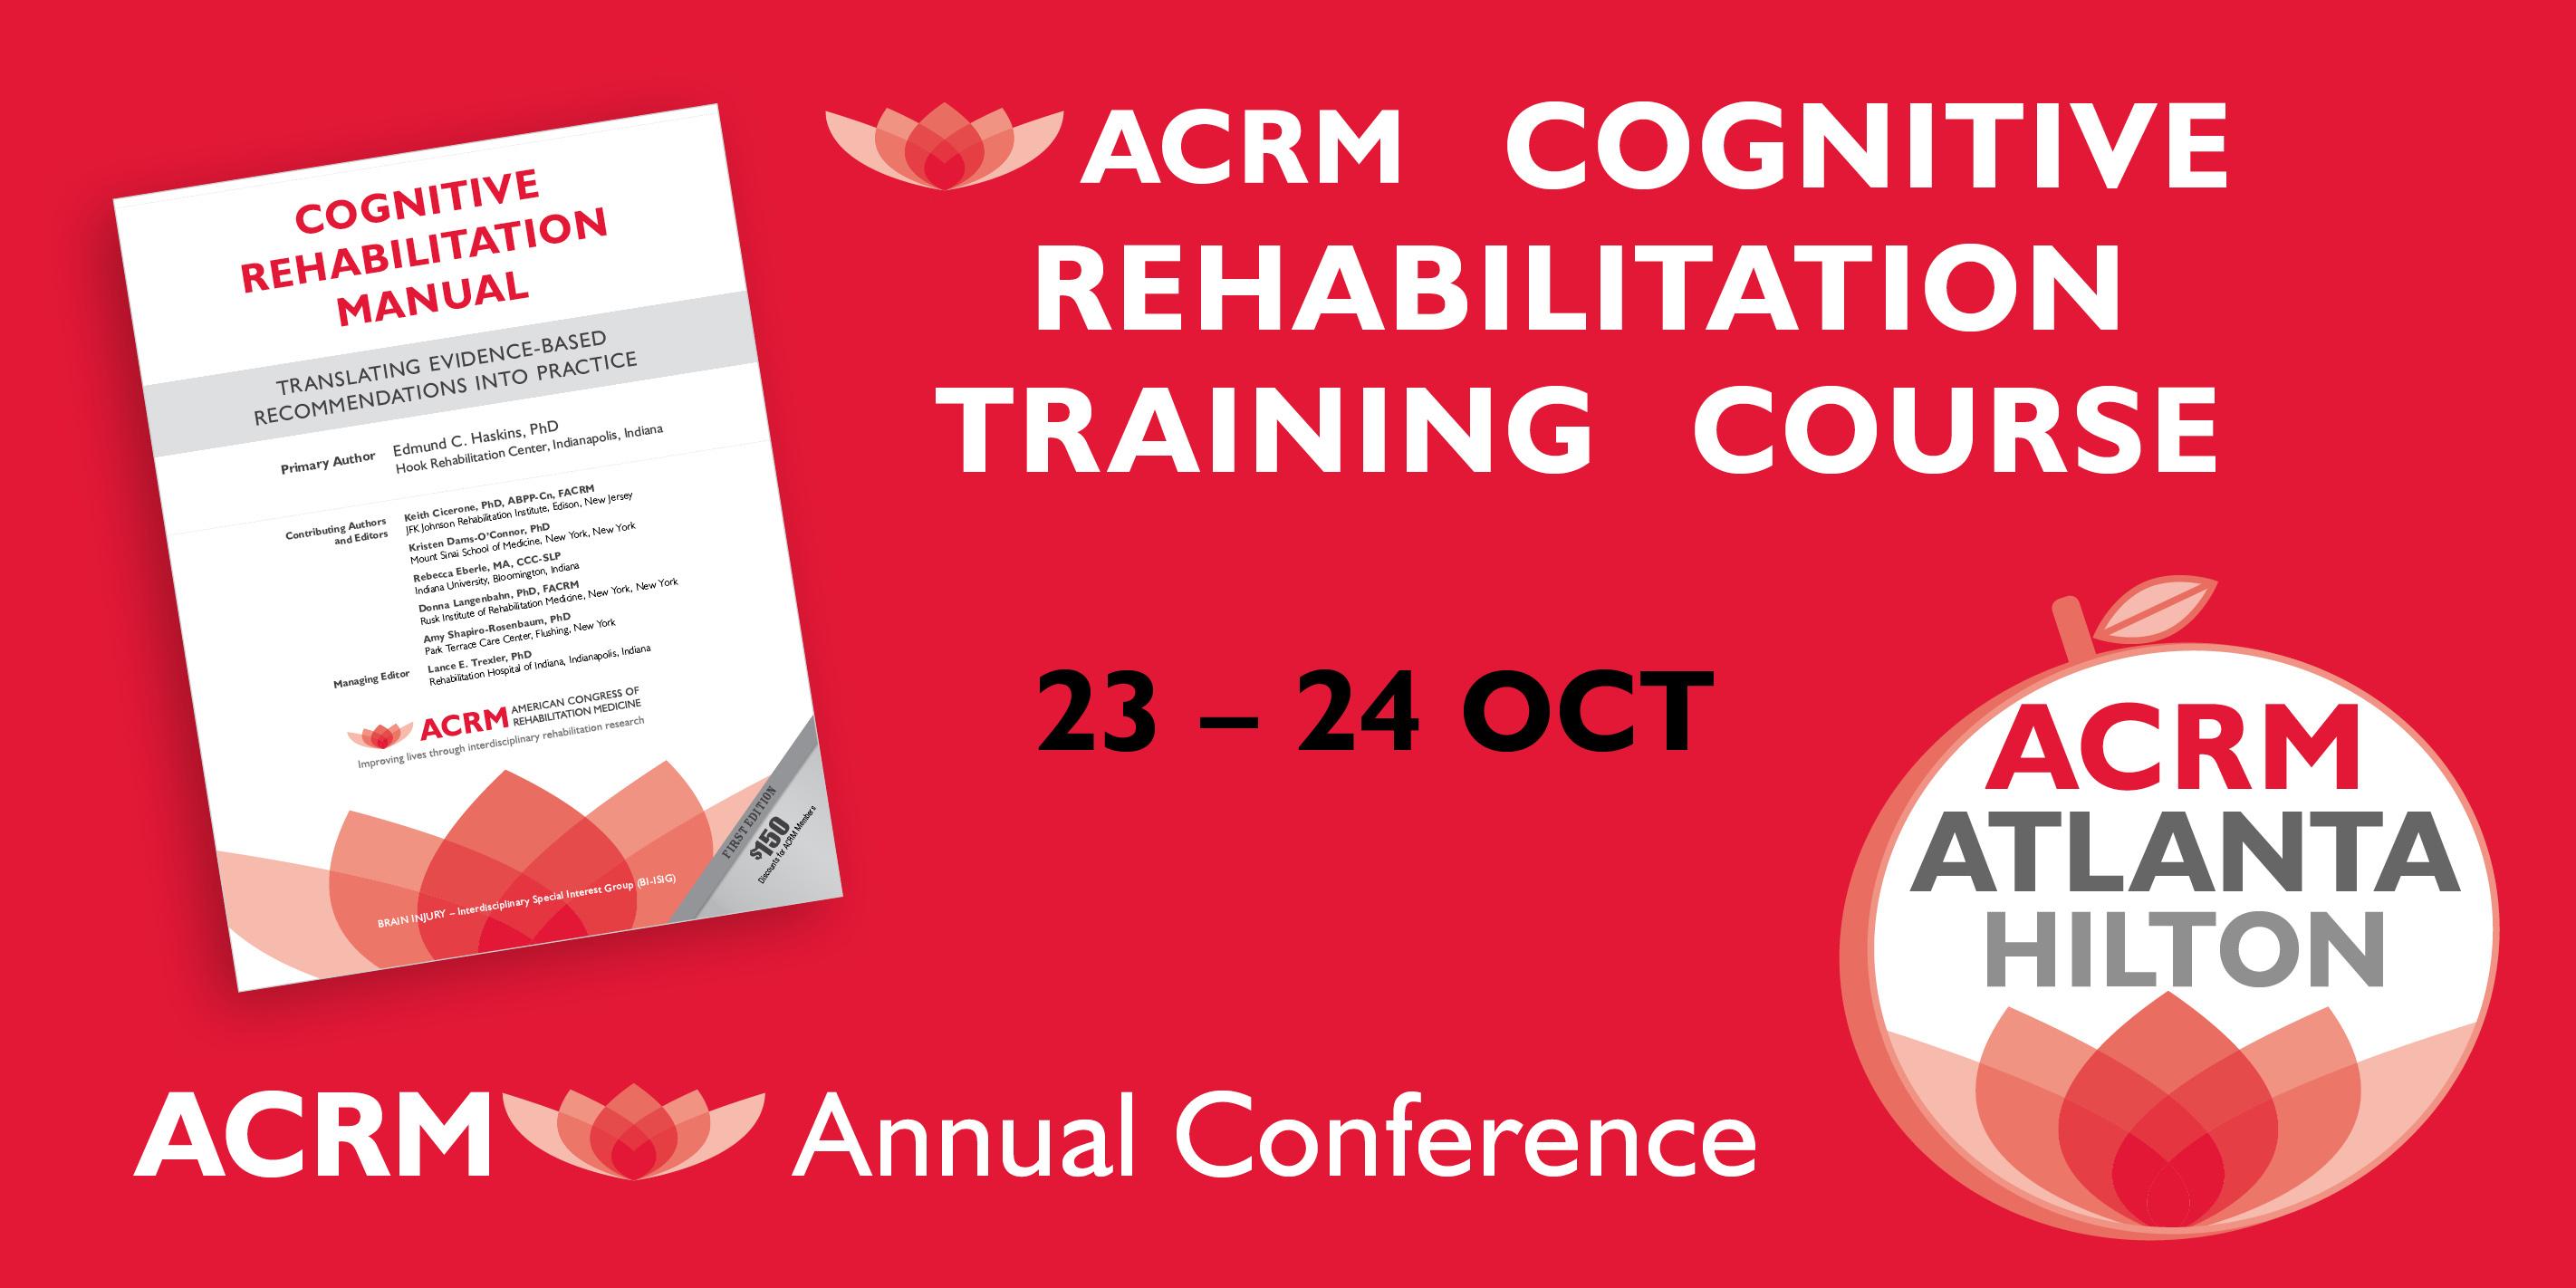 ACRM Conference: Cognitive Rehabilitation Training Course: 23 - 24 OCT 2017 / ATLANTA HILTON